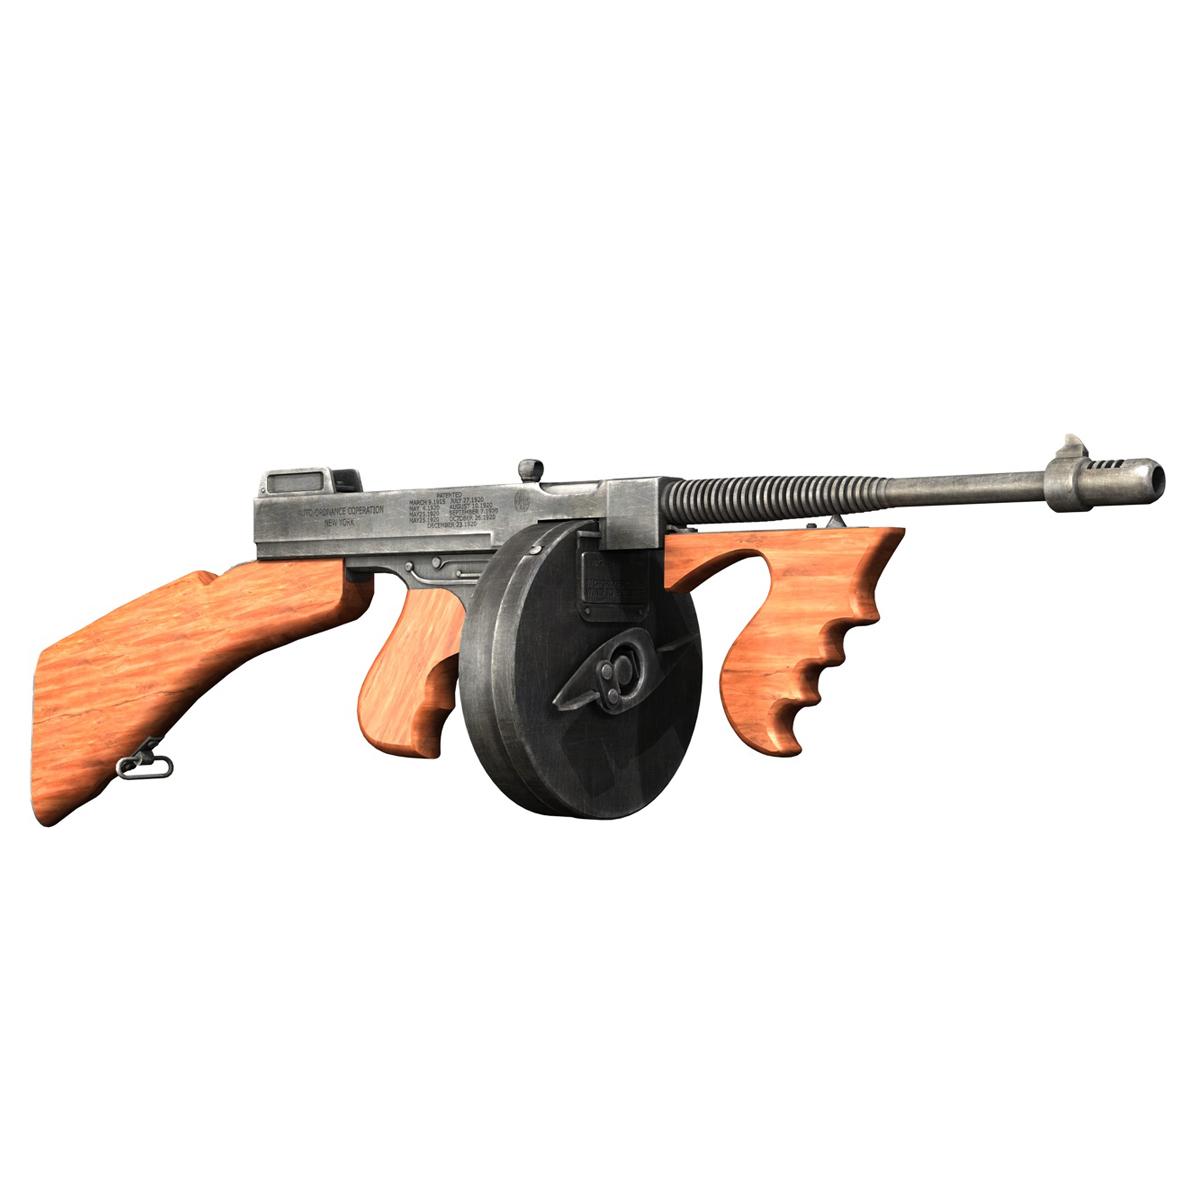 colt model1921 thompson submachine gun 3d model 3ds c4d lwo obj 264705